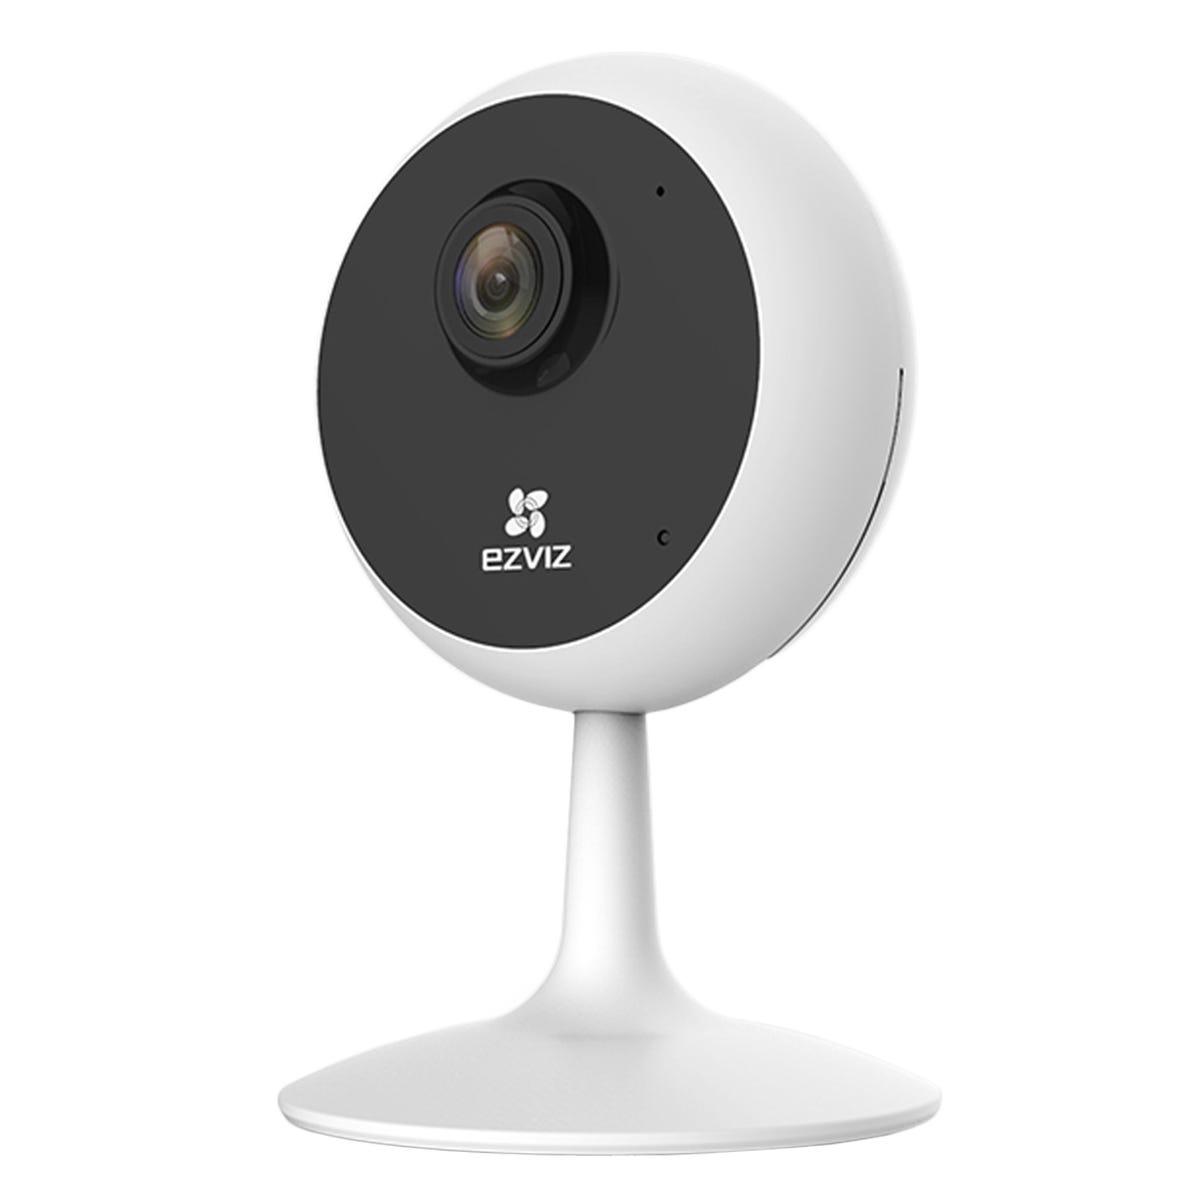 EZVIZ C1C WIFI Indoor Smart Home Security Camera HD 720p - White